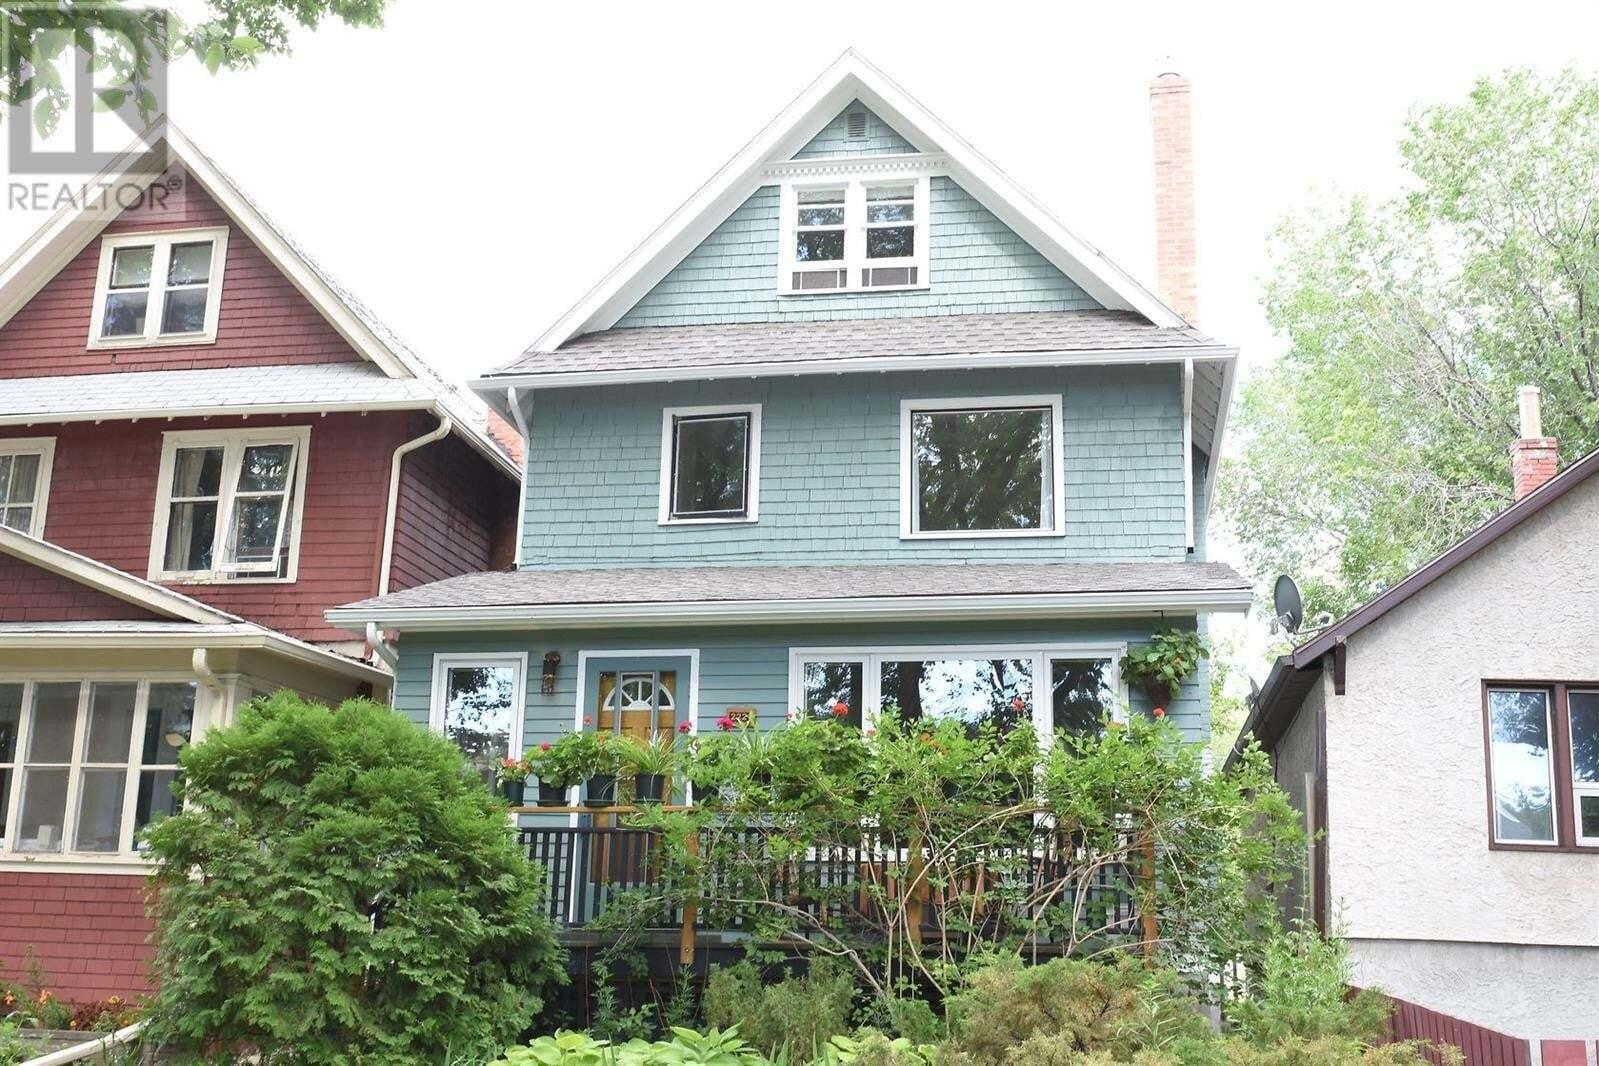 House for sale at 2221 Garnet St Regina Saskatchewan - MLS: SK816836